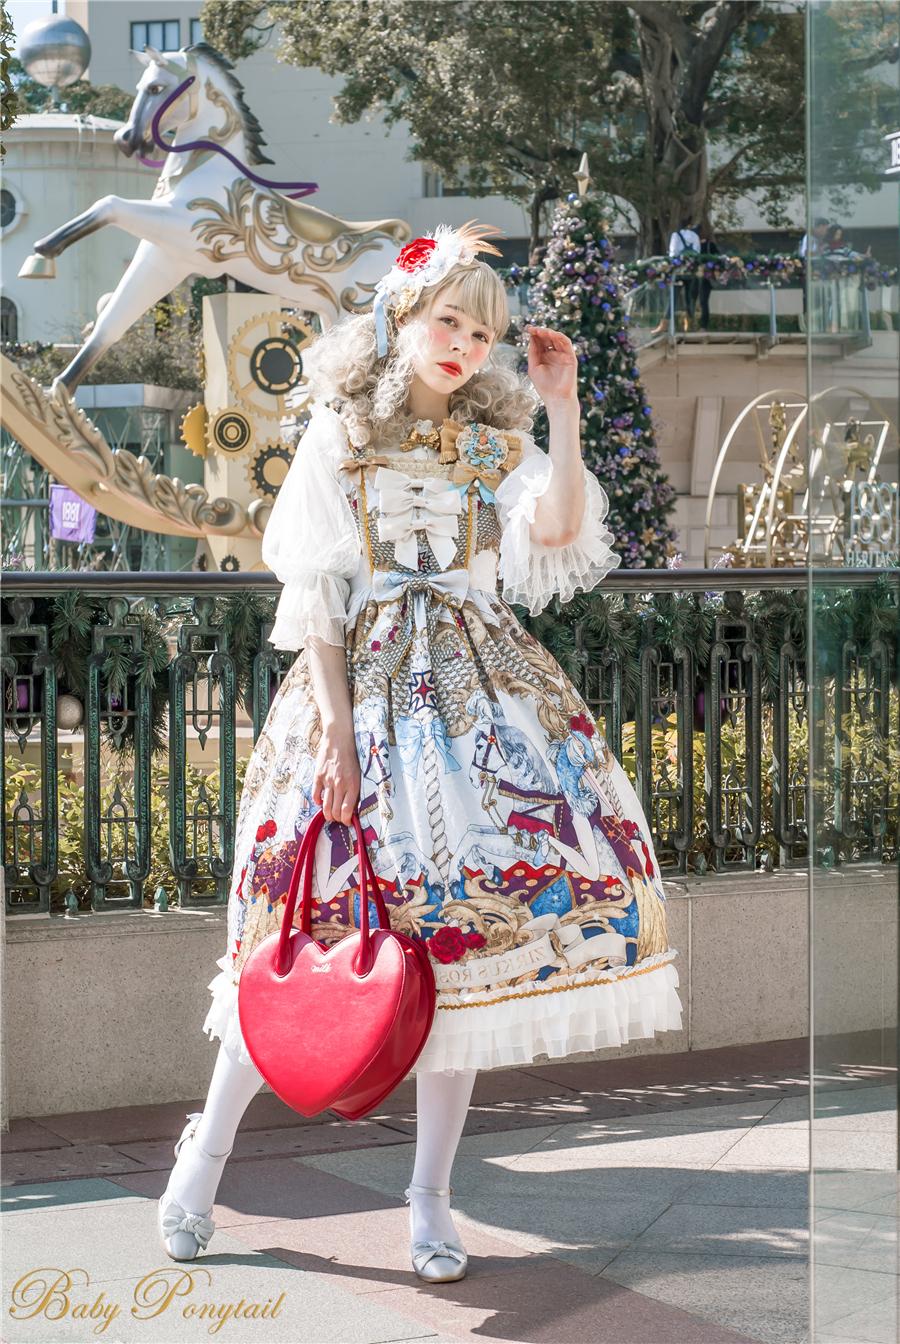 Baby Ponytail_Circus Princess_Silver JSK_Claudia04.jpg